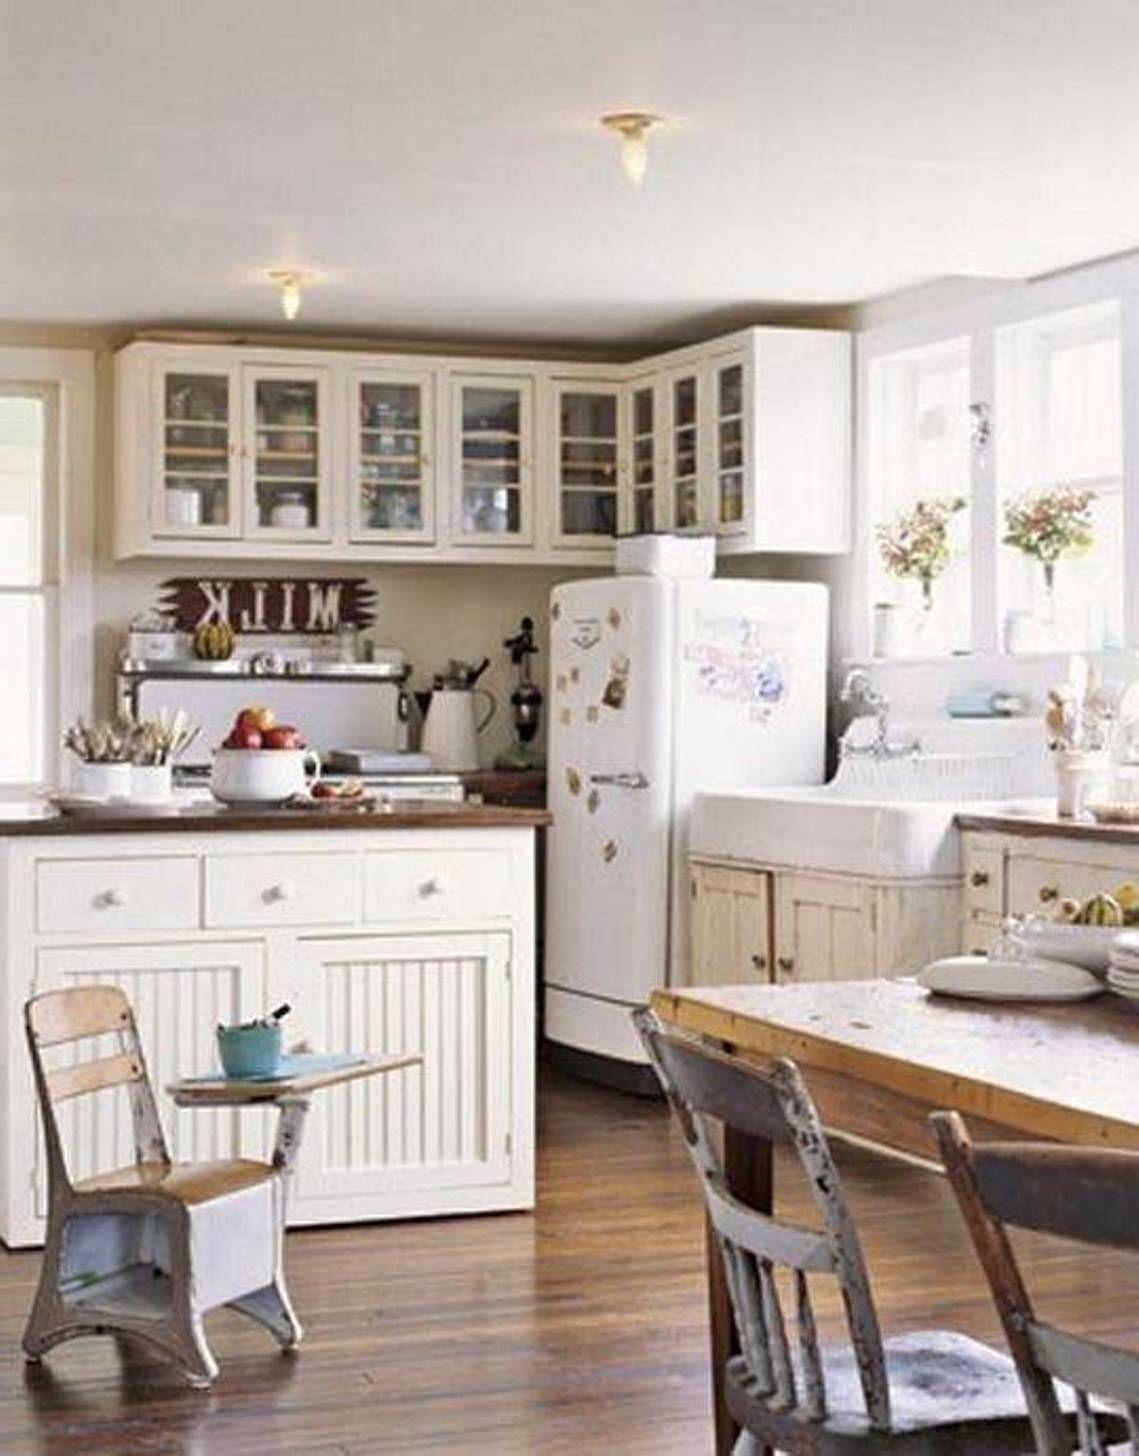 Shabby chic white kitchen farmhouse style kitchen design ideas and